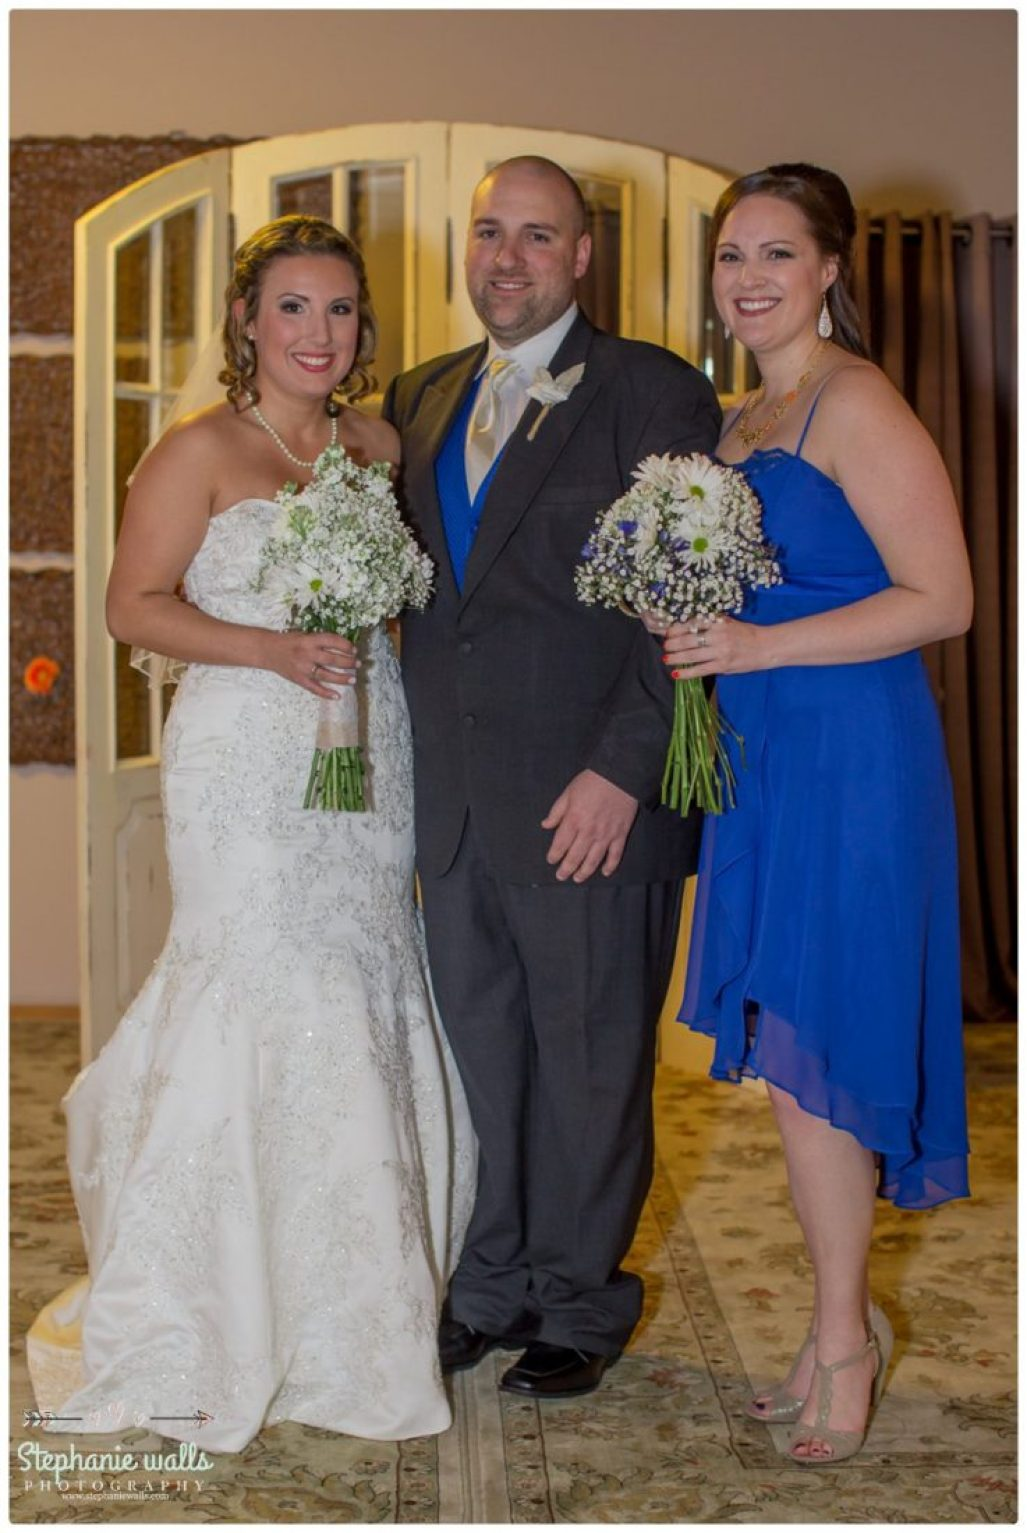 2016 03 24 0018 Racing Love   Snohomish Event Center   Snohomish Wedding Photographer